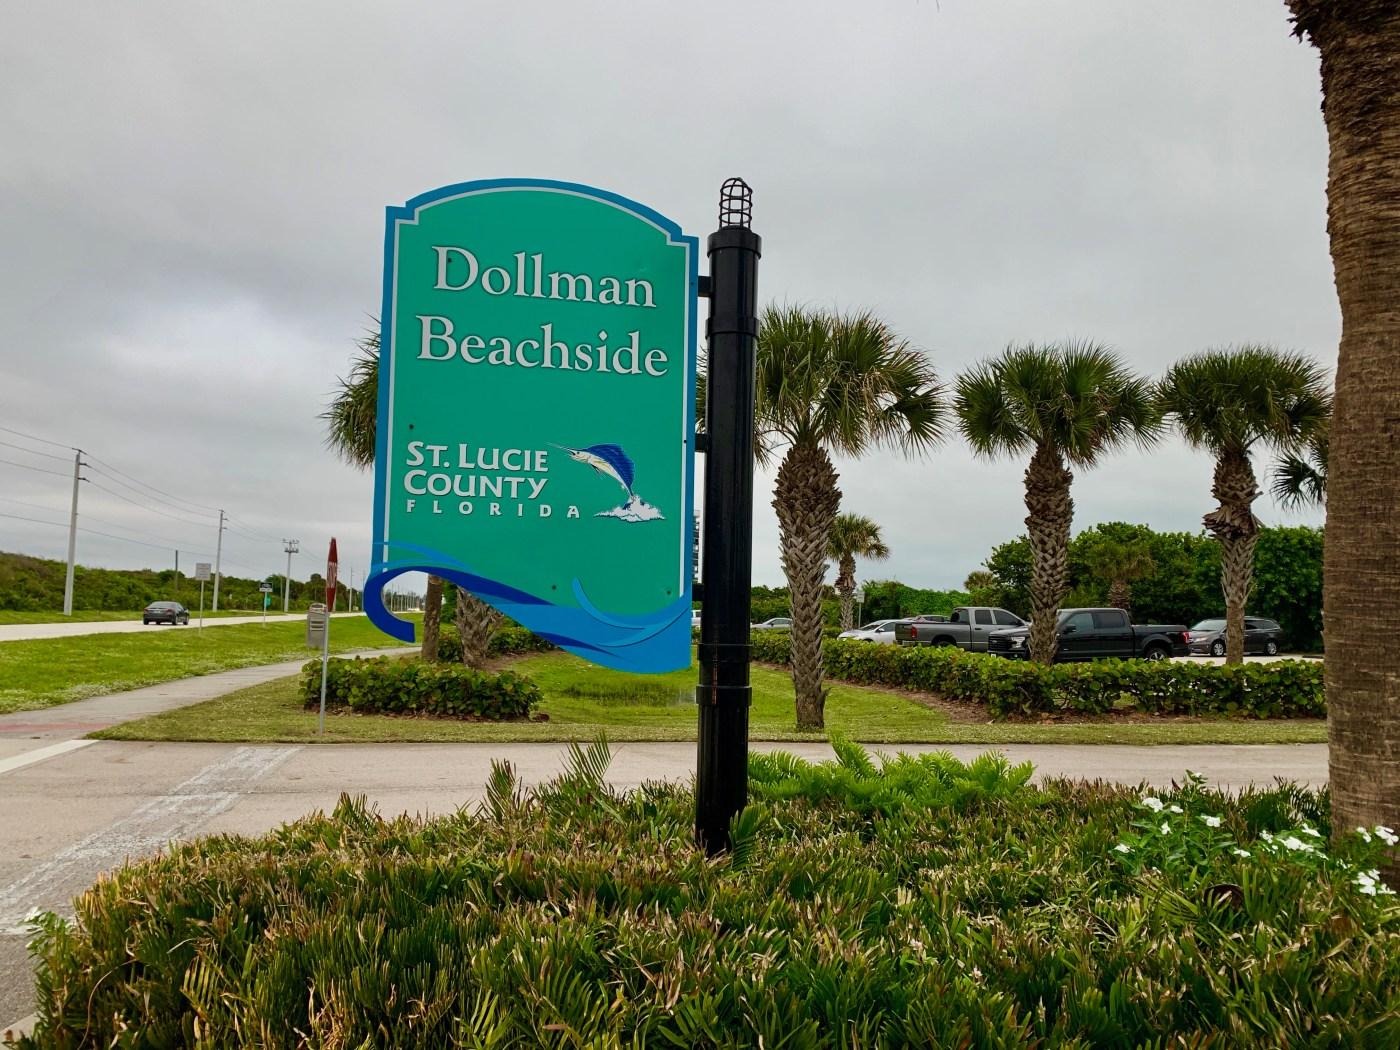 Dollman Beachside